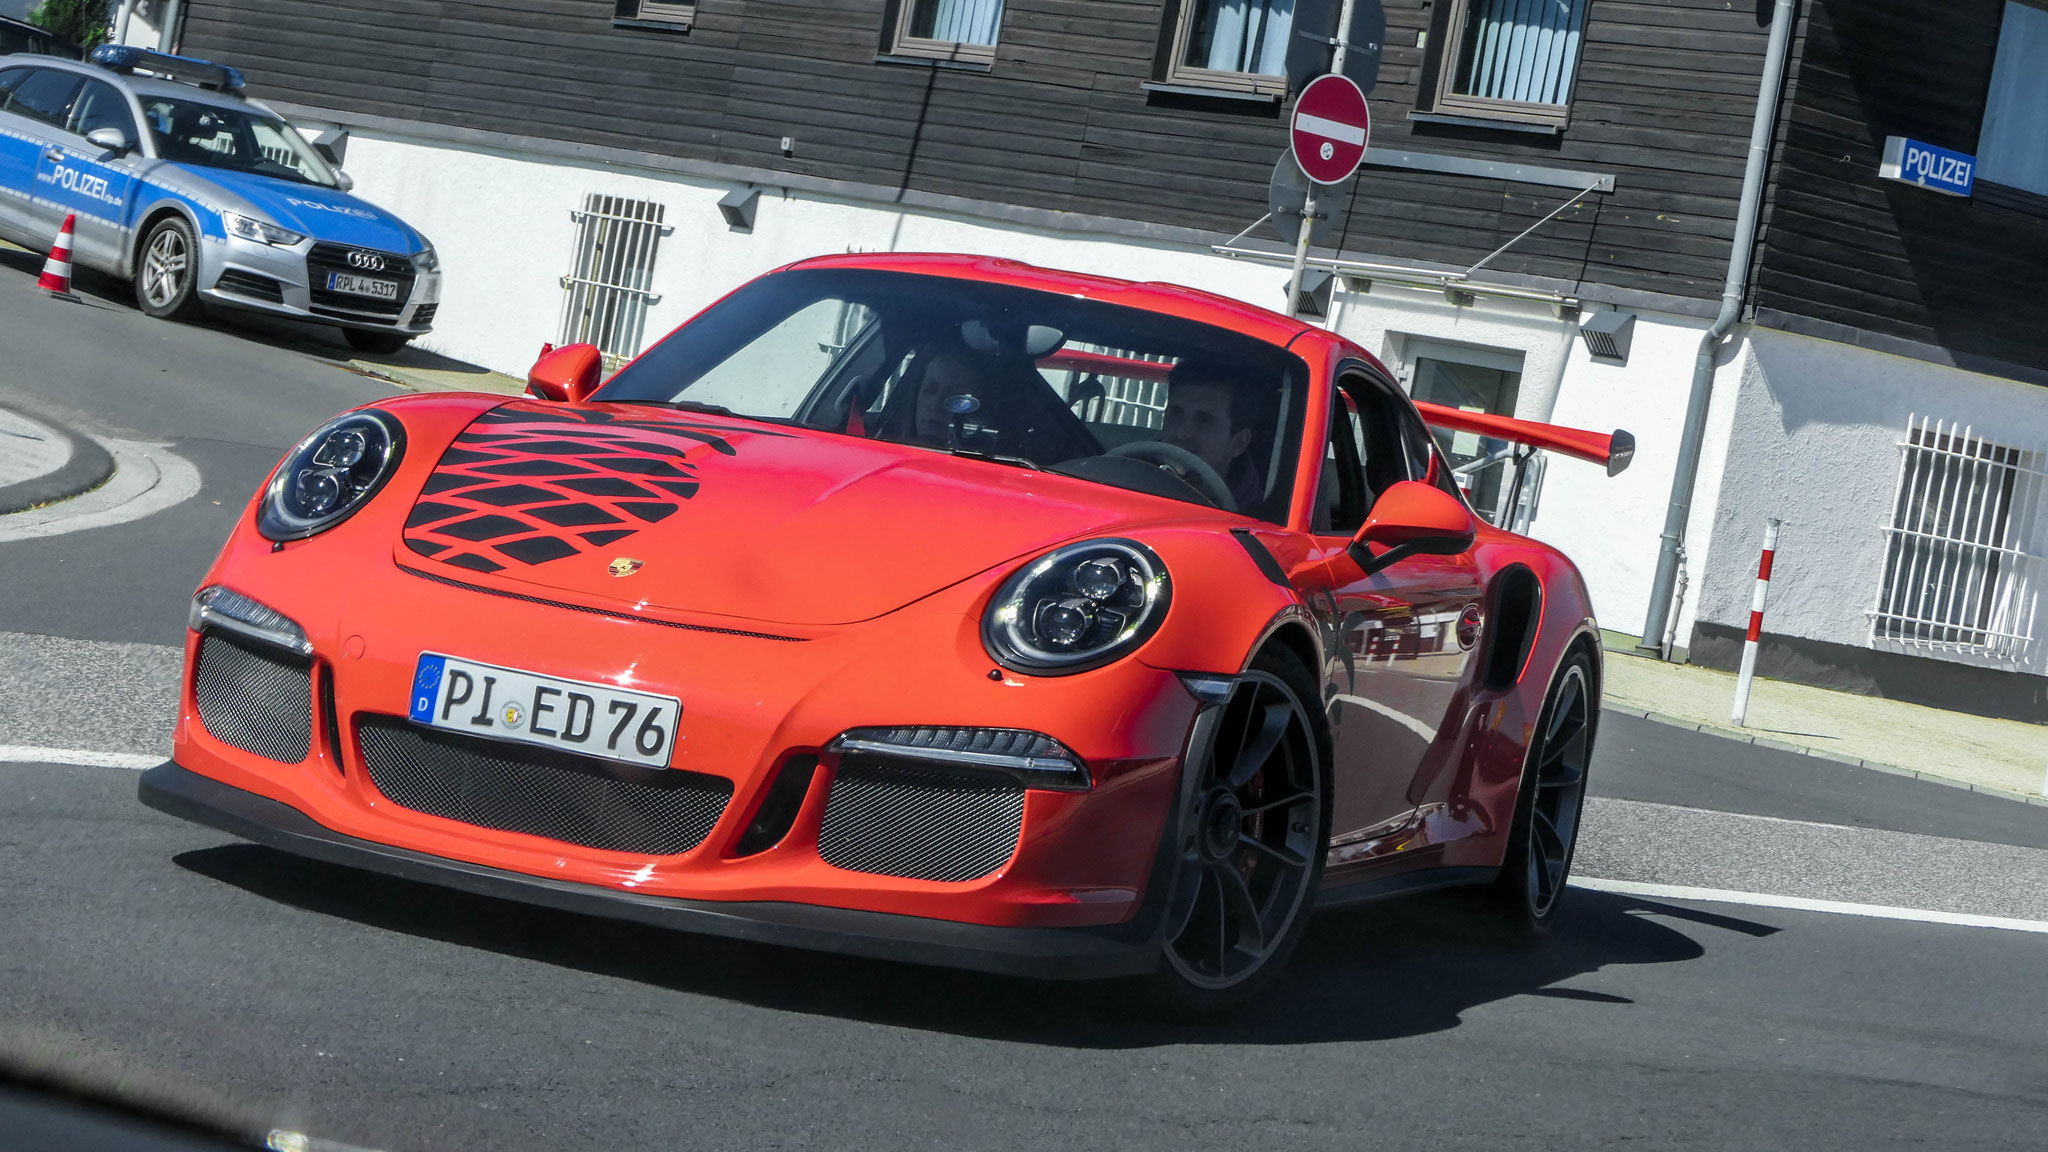 Porsche 911 GT3 RS - PI-ED-76